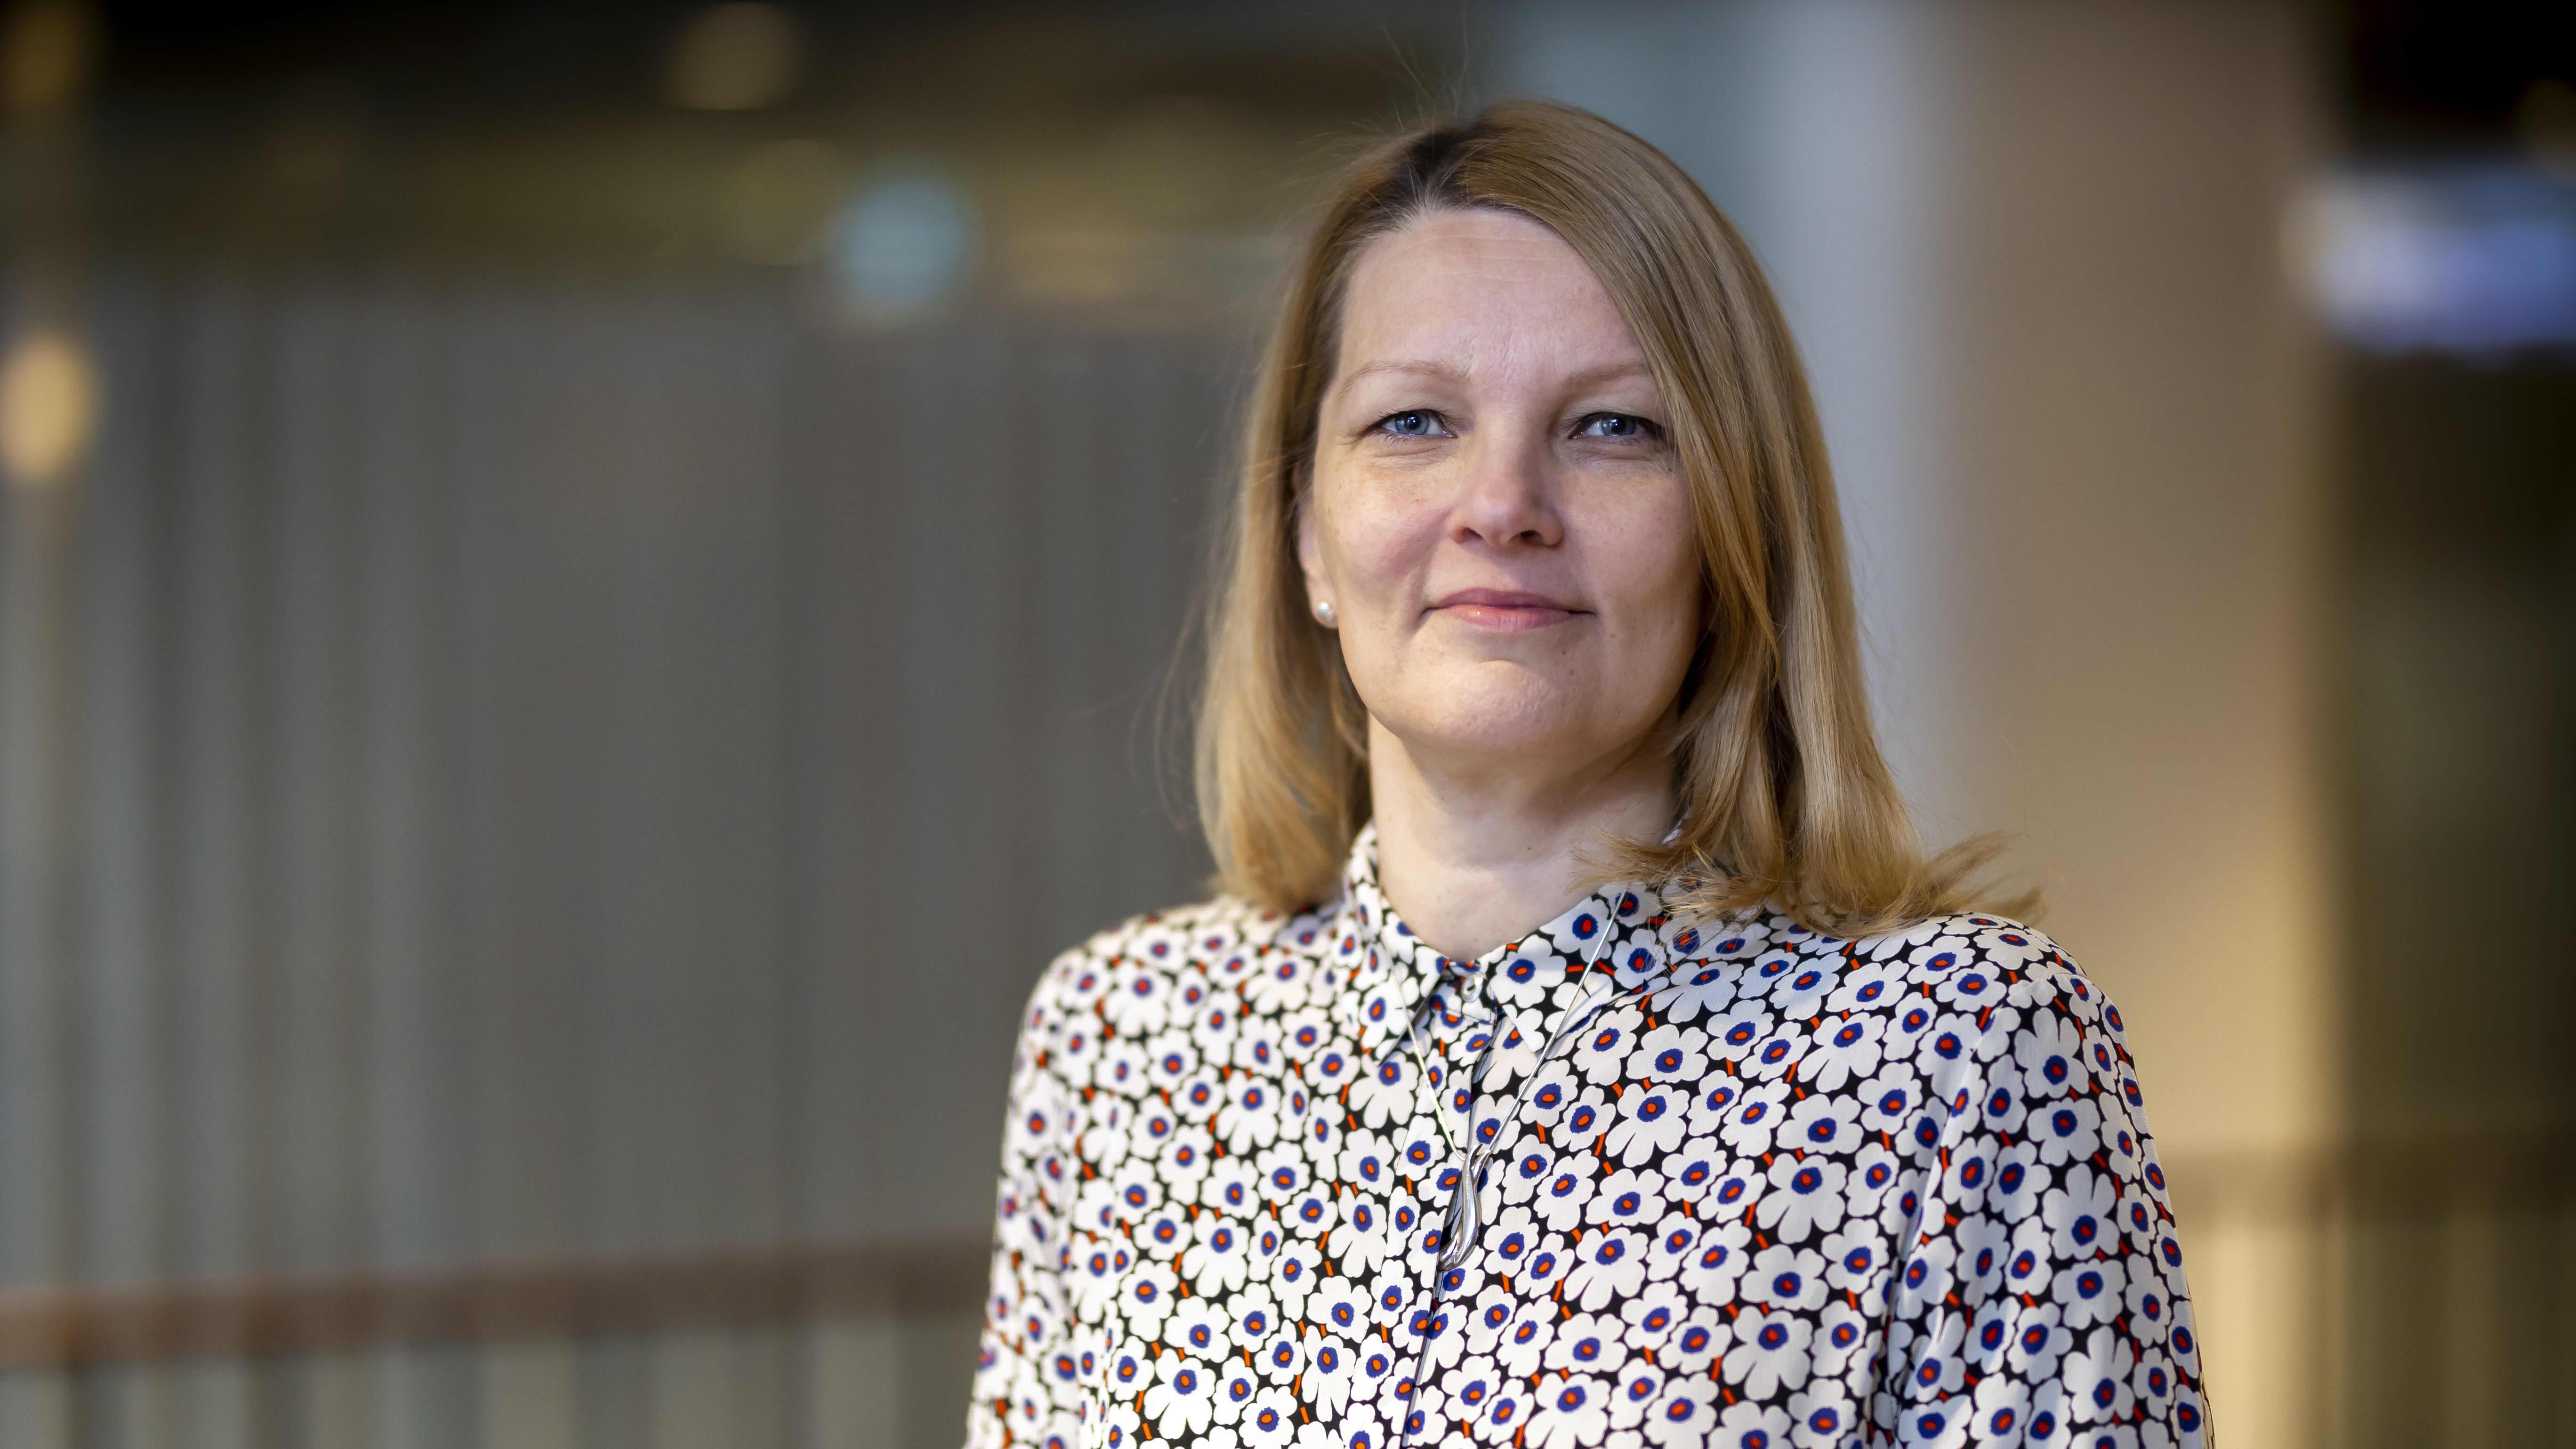 Kaupanliiton toimitusjohtaja (2019-) Mari Kiviniemi.